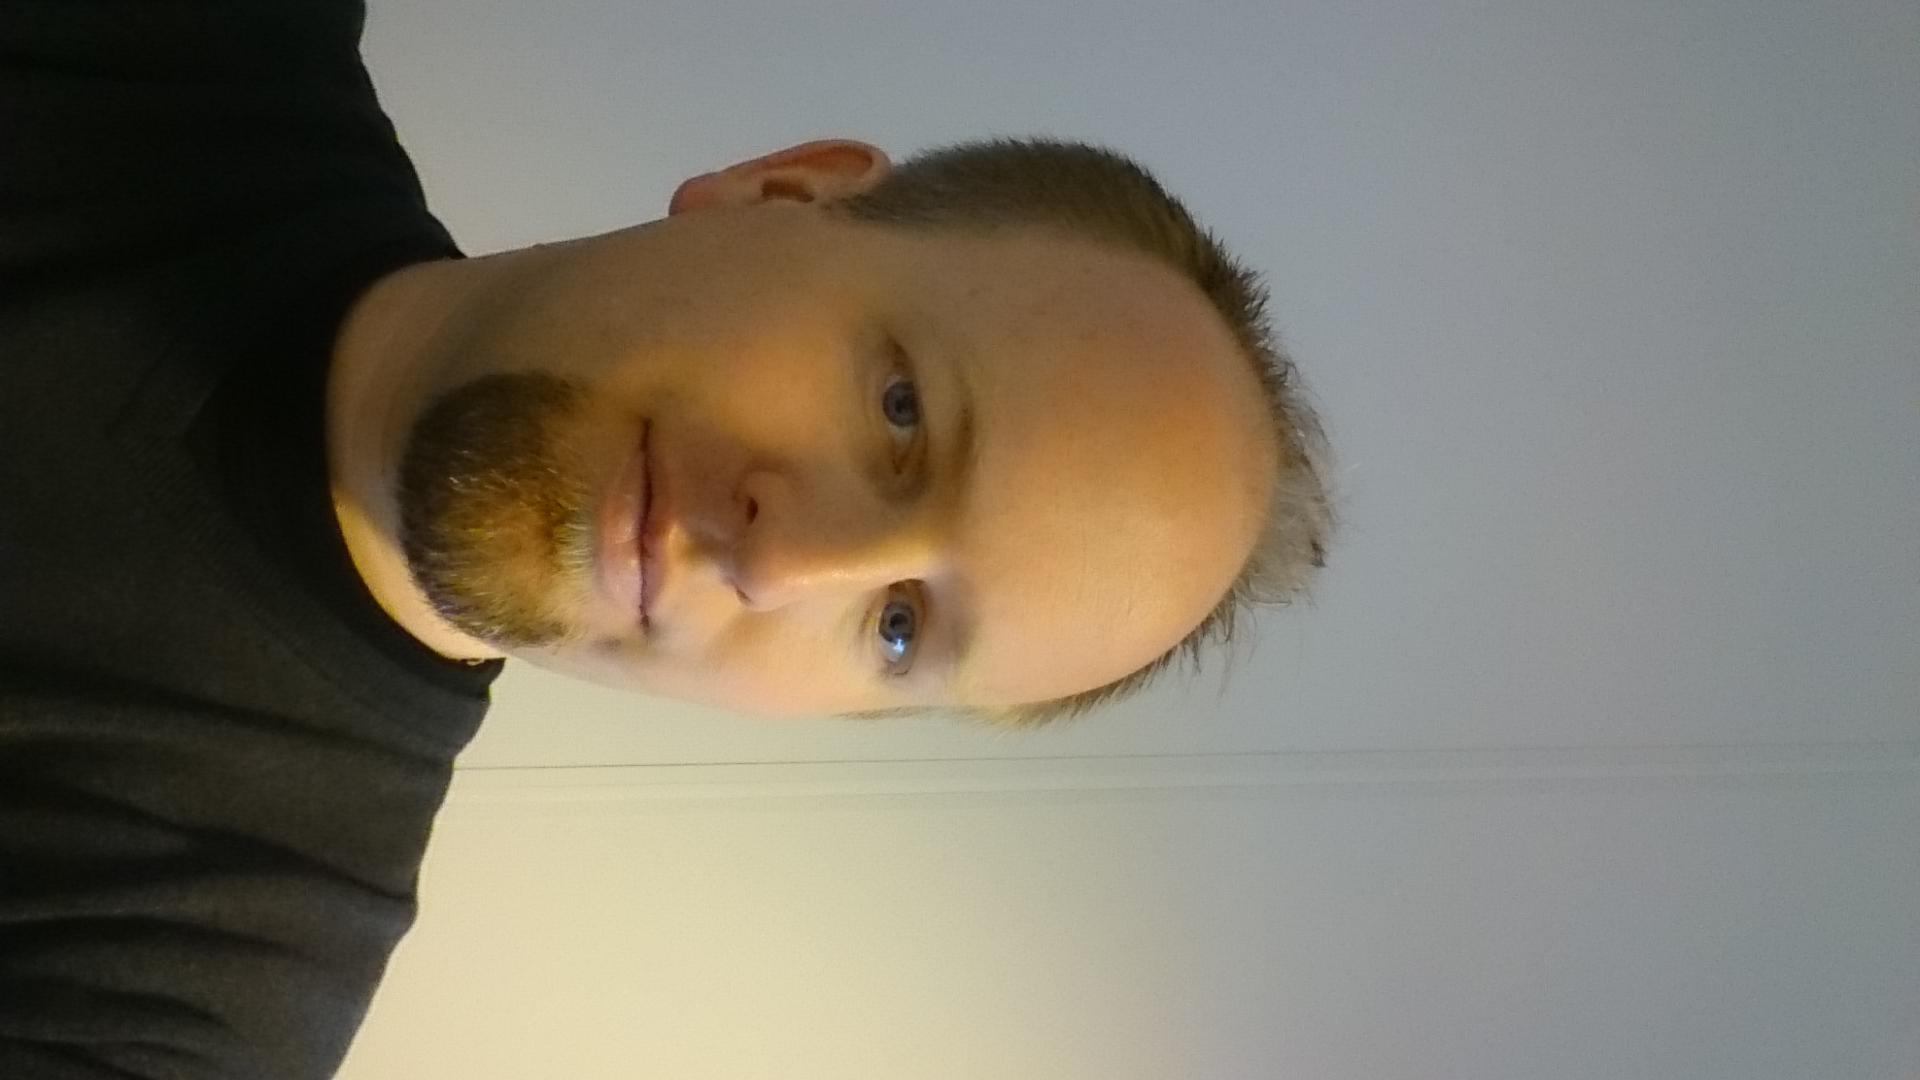 Johan Kristian Nygård